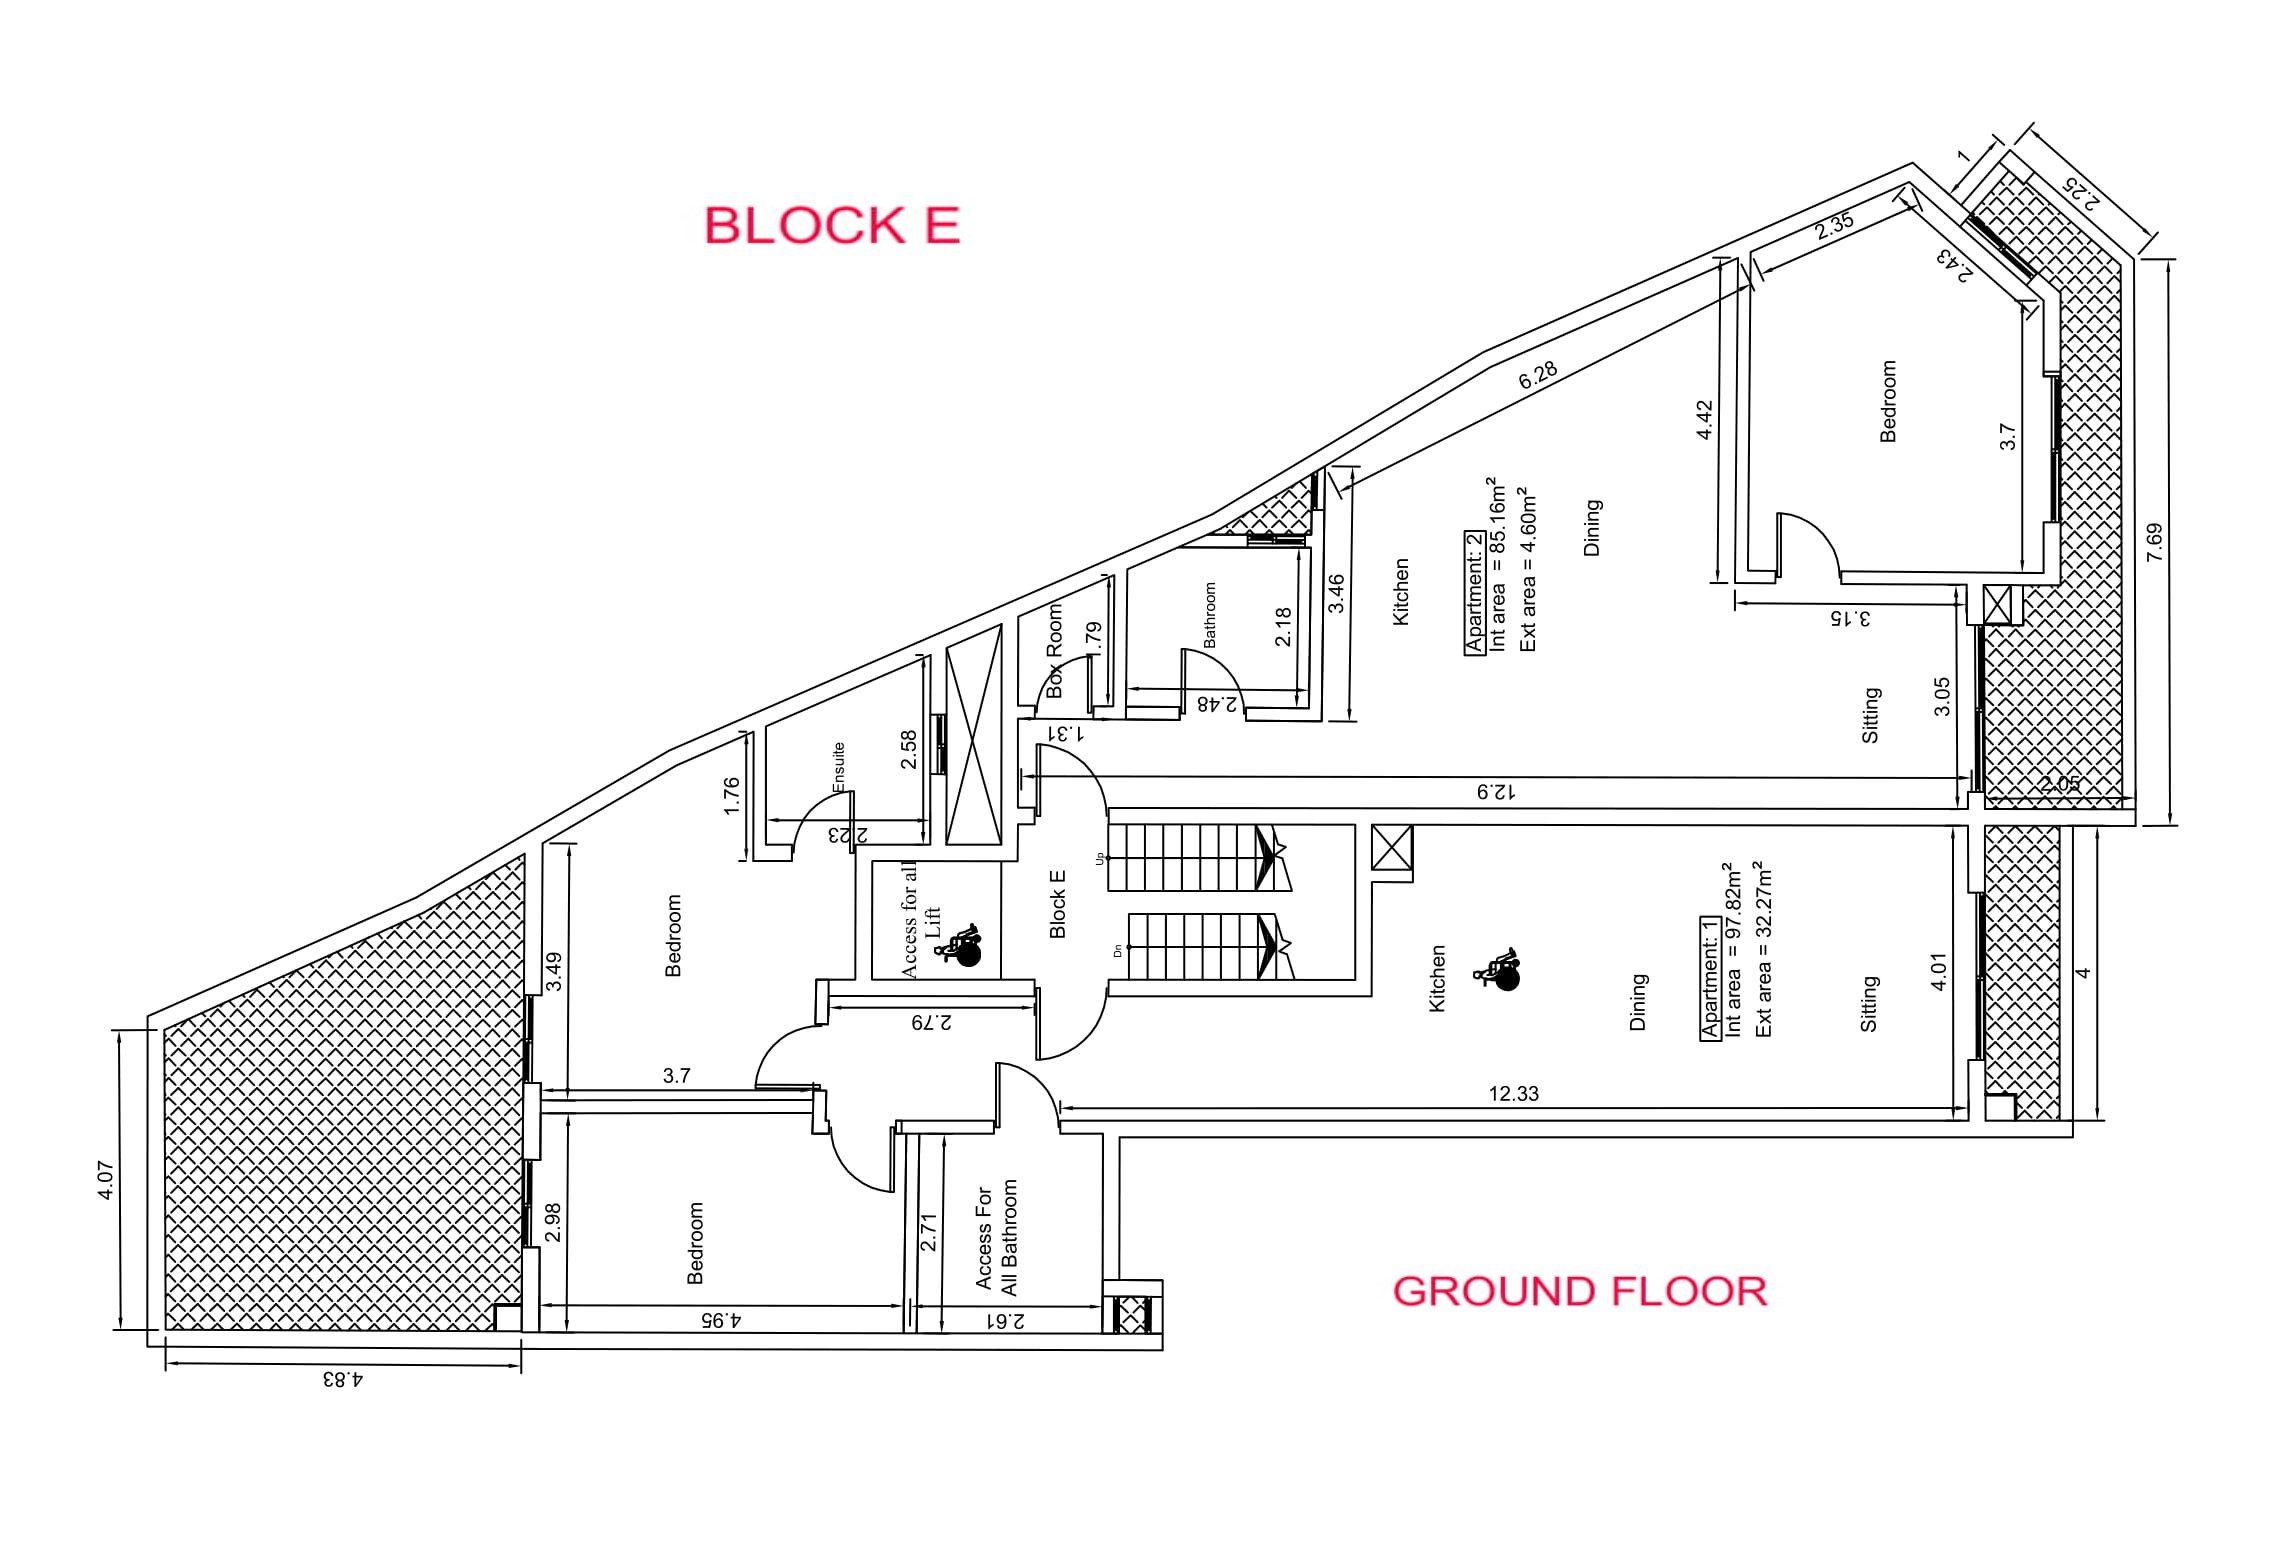 Block E - Ground Floor